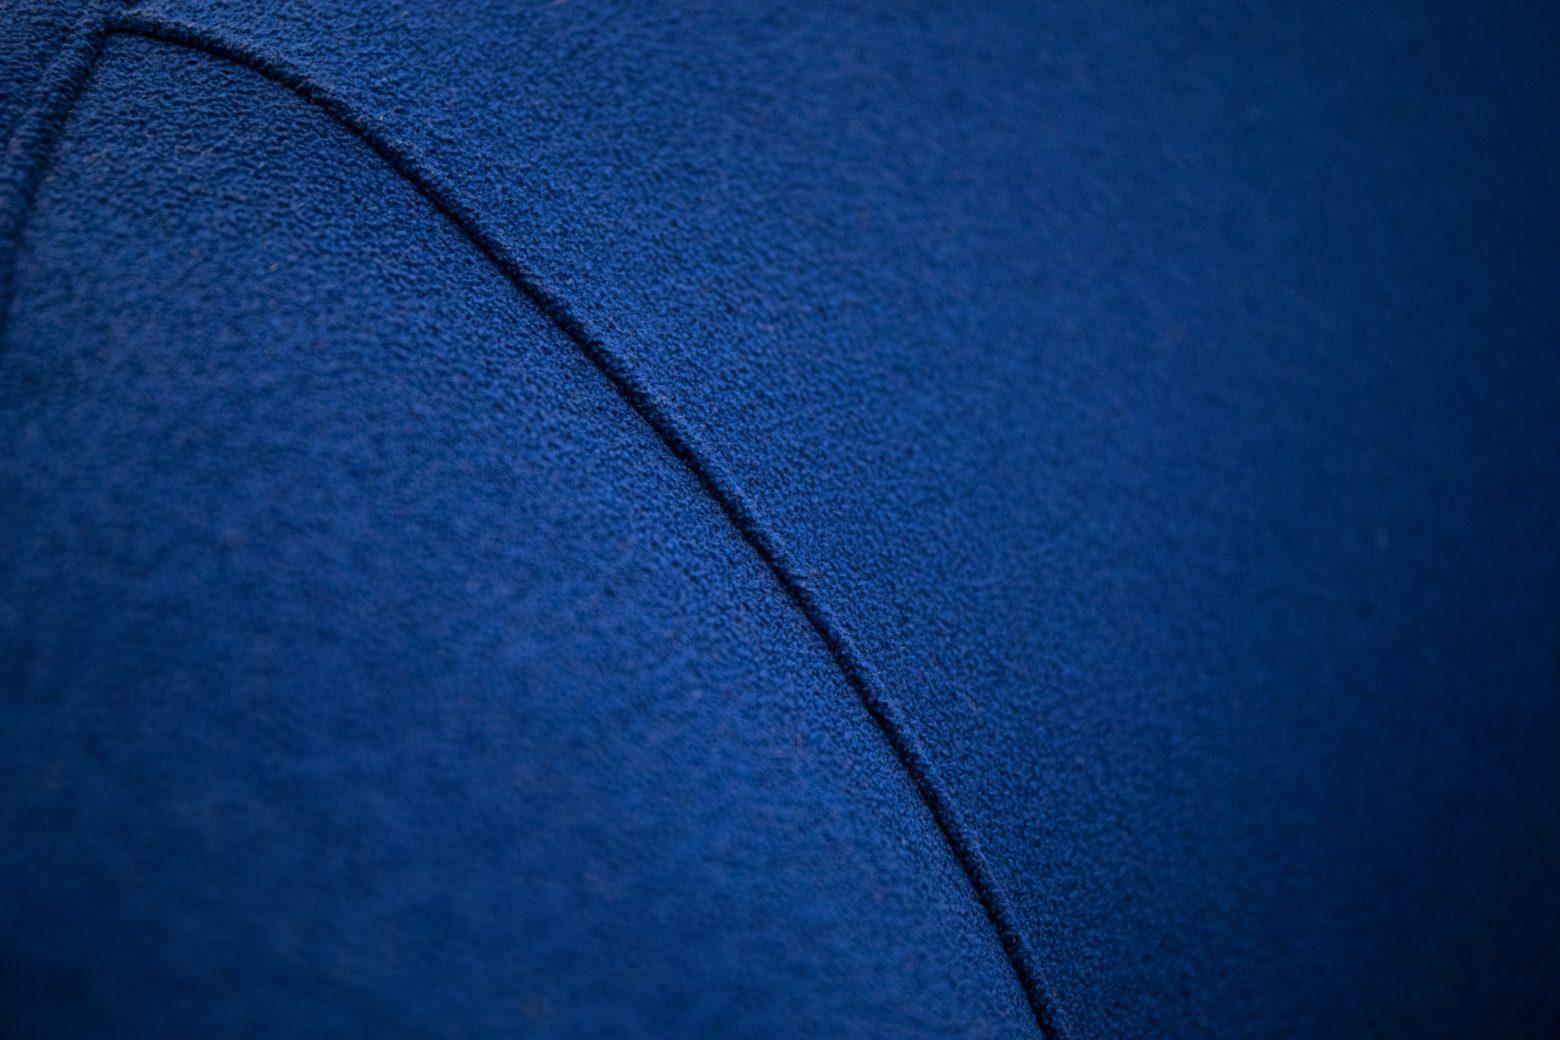 Divano blu veronesi part